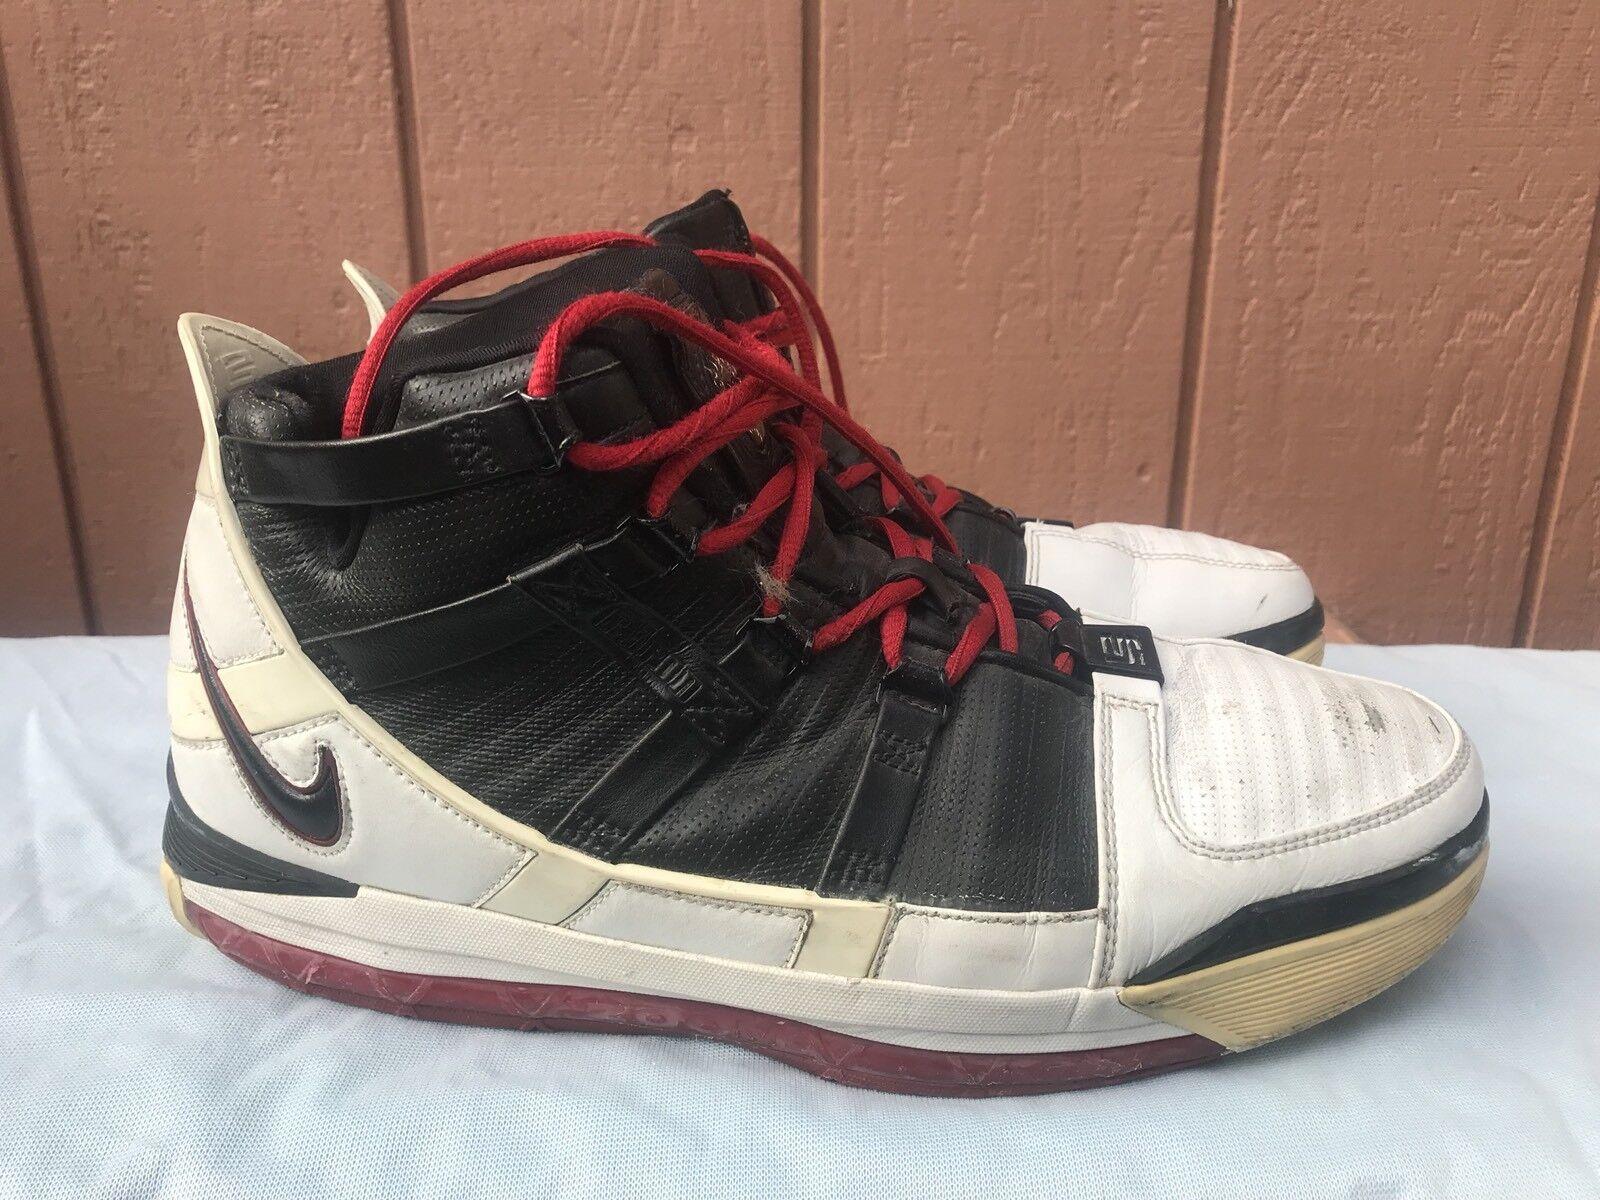 Nike Zoom Lebron III 3 US 11 White/Black-Varsity Red Lebron James A3